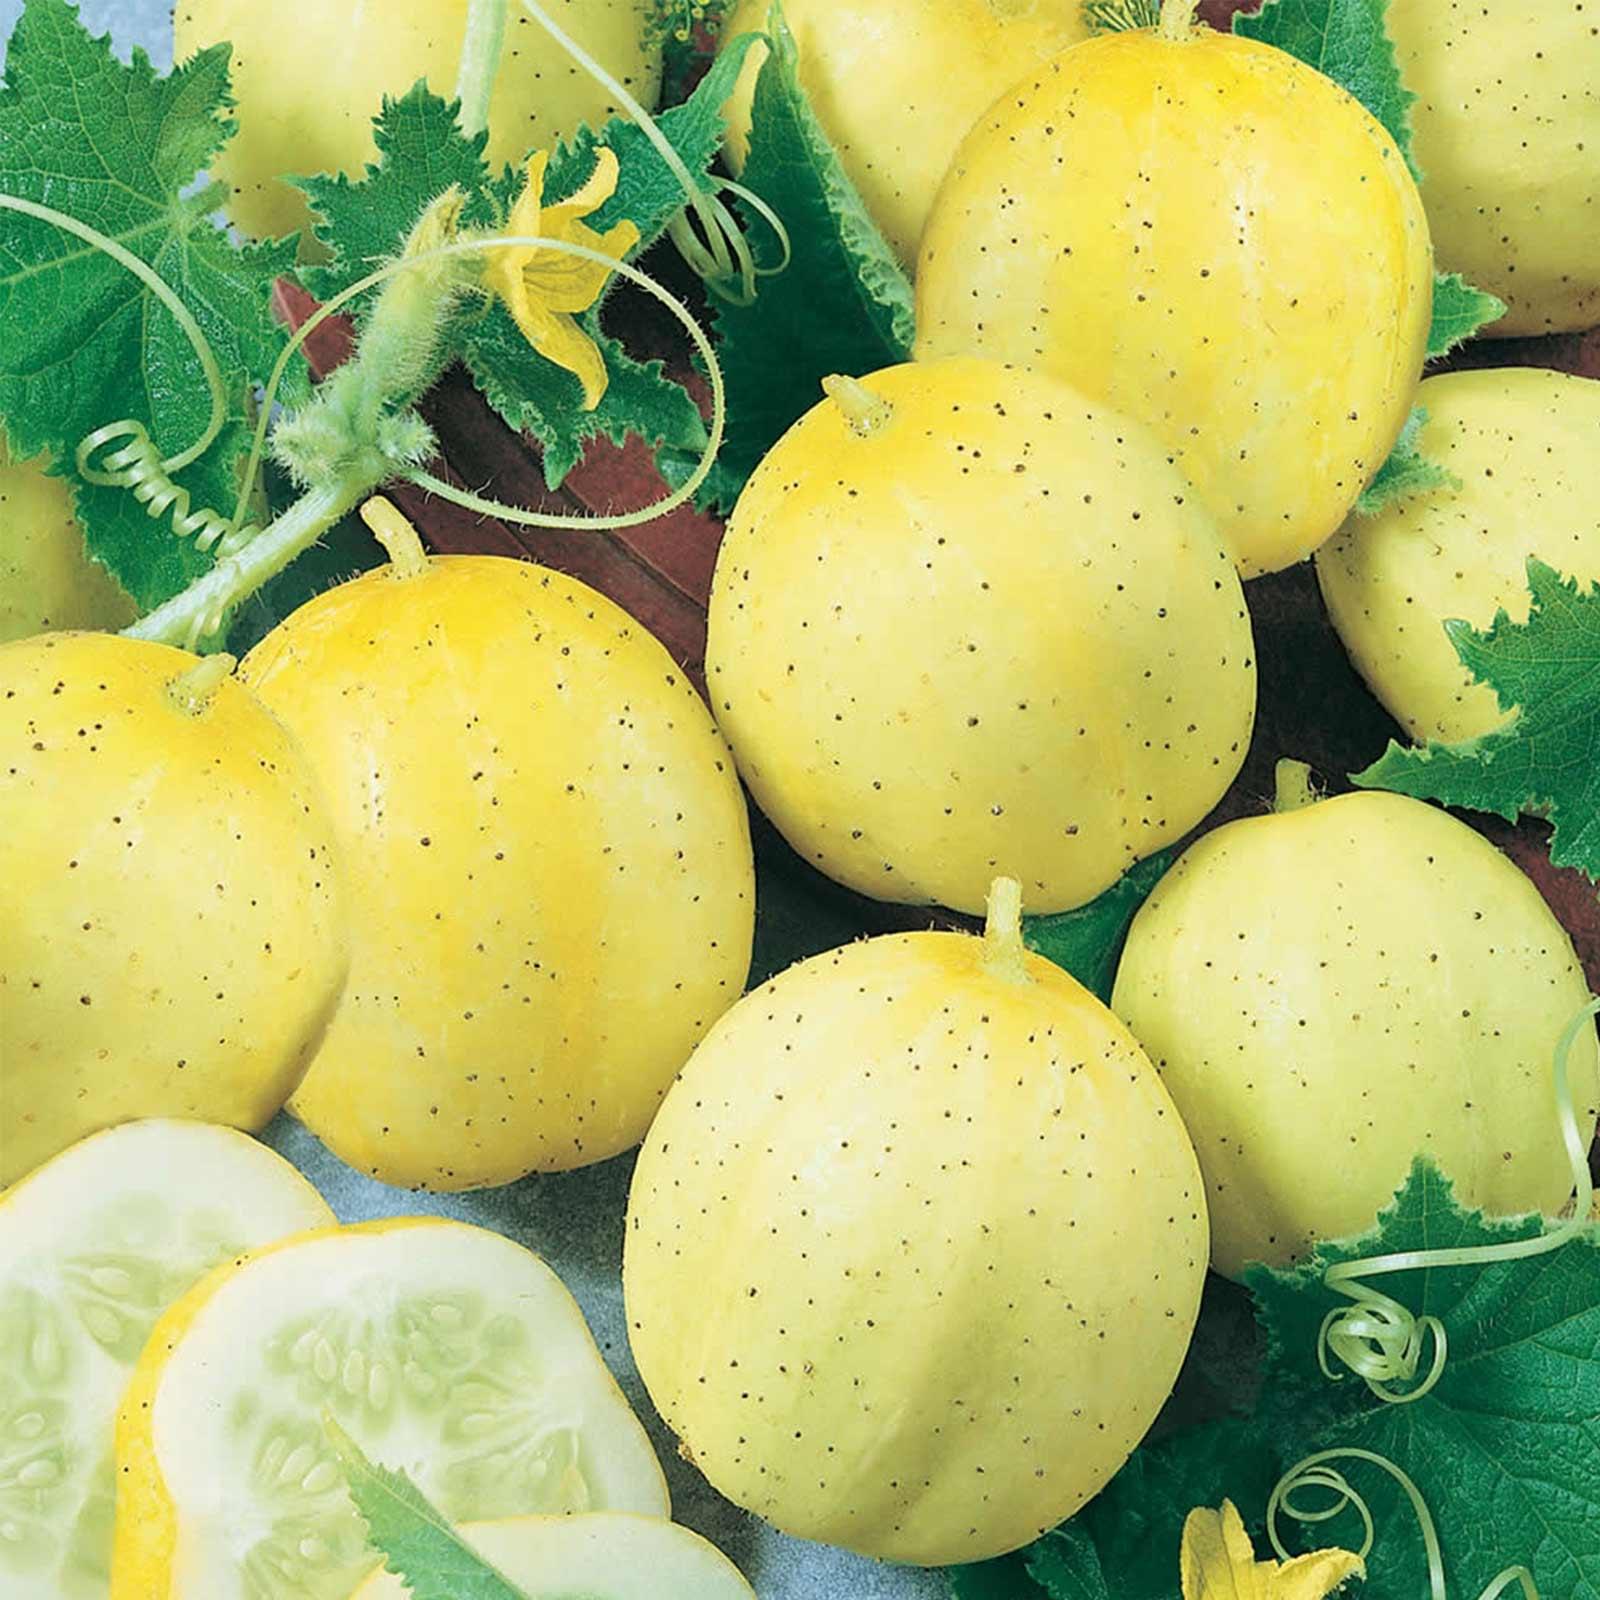 Lemon Cucumber Garden Seeds - 1 Oz - Non-GMO, Heirloom Vegetable Gardening Seeds - Yellow Cucumbers